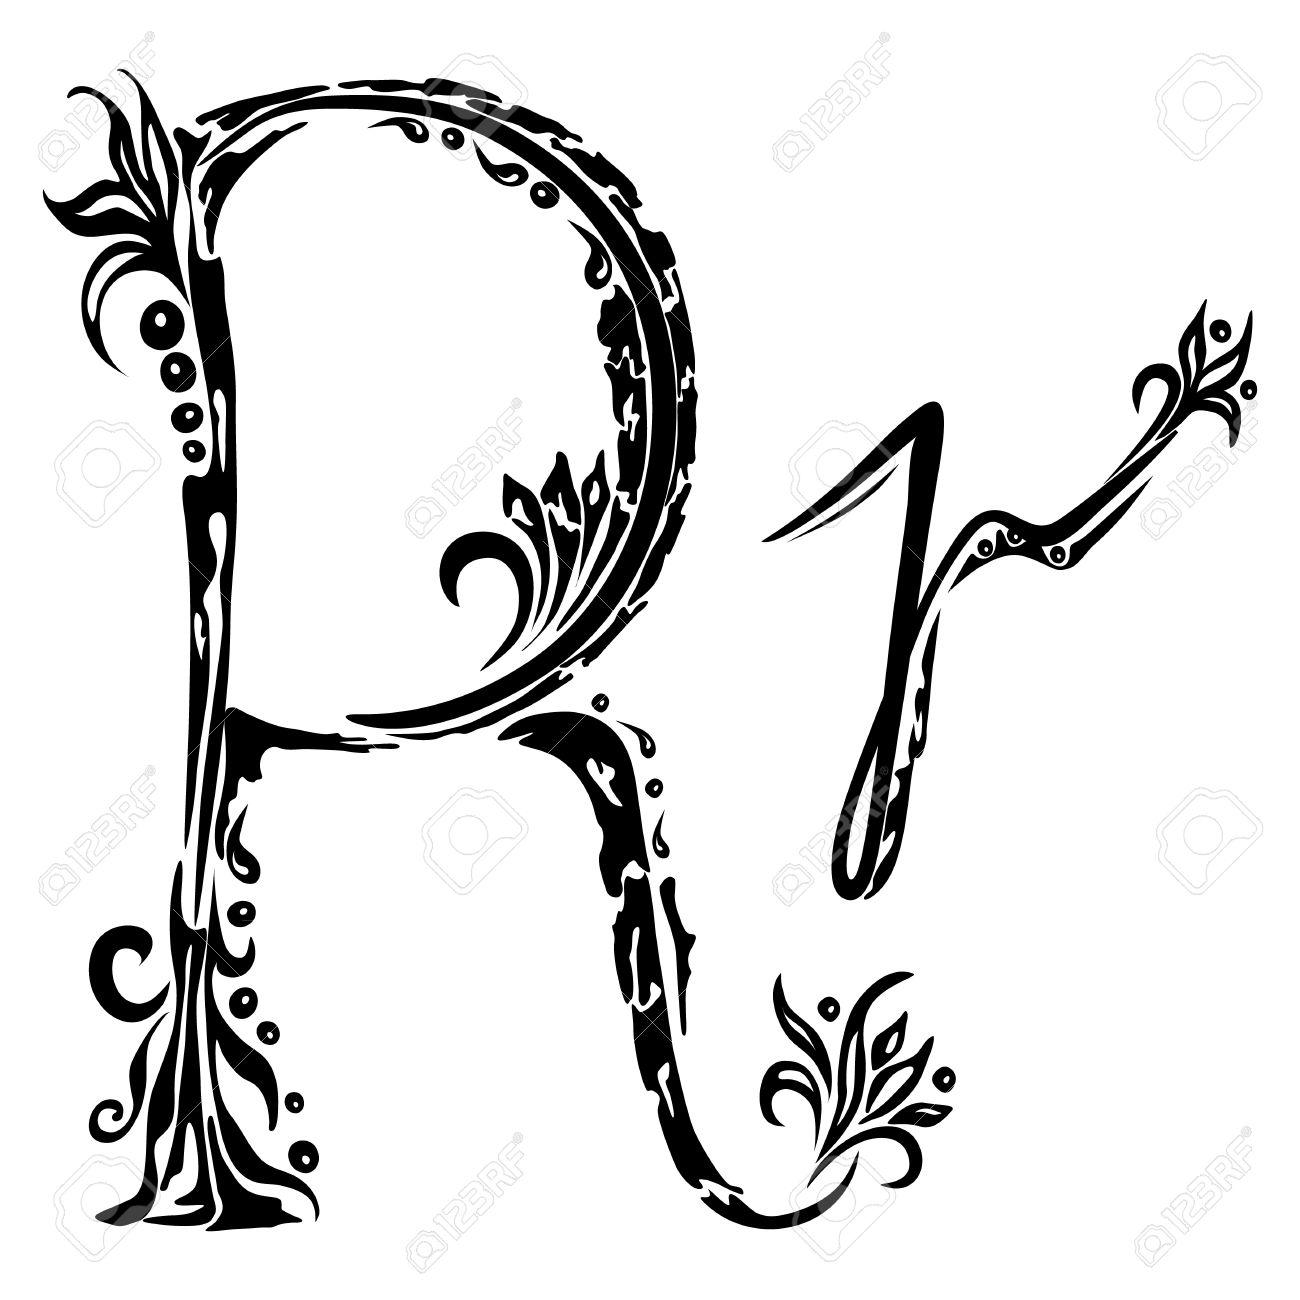 صورة صور حرف r , خلفيات موخرفة لحرف r